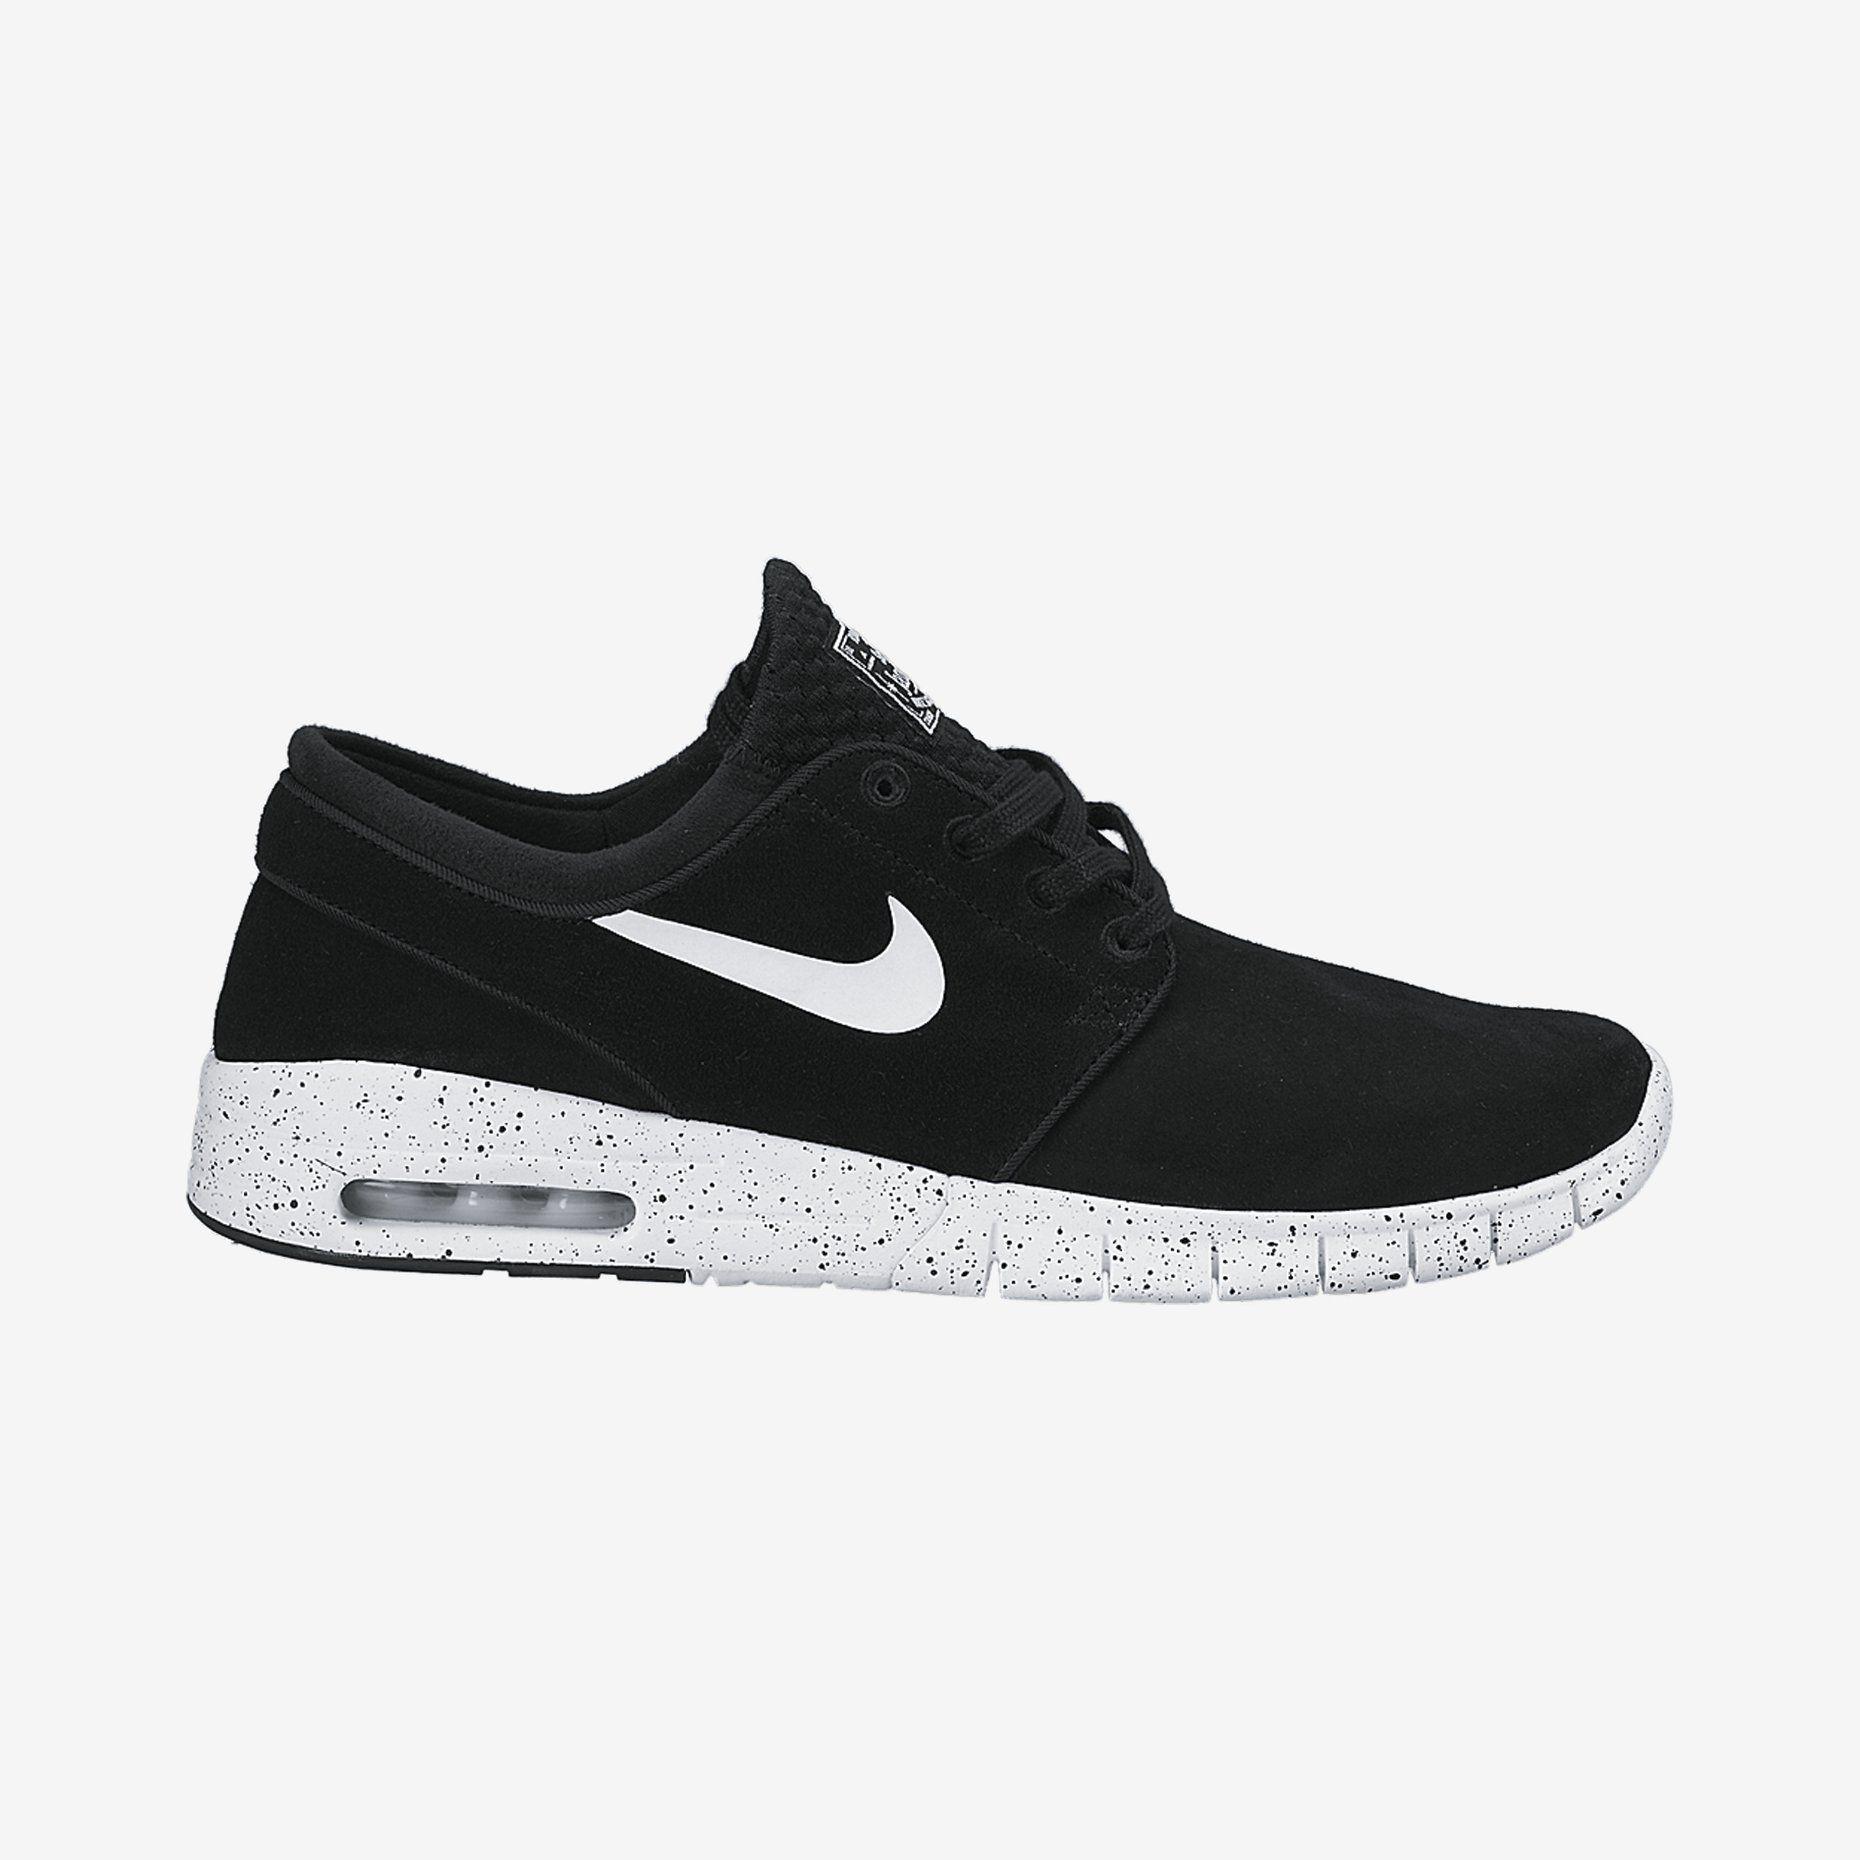 403ae9f0b5 Nike SB Stefan Janoski Max Suede Men's Skateboarding Shoe | I'm ...